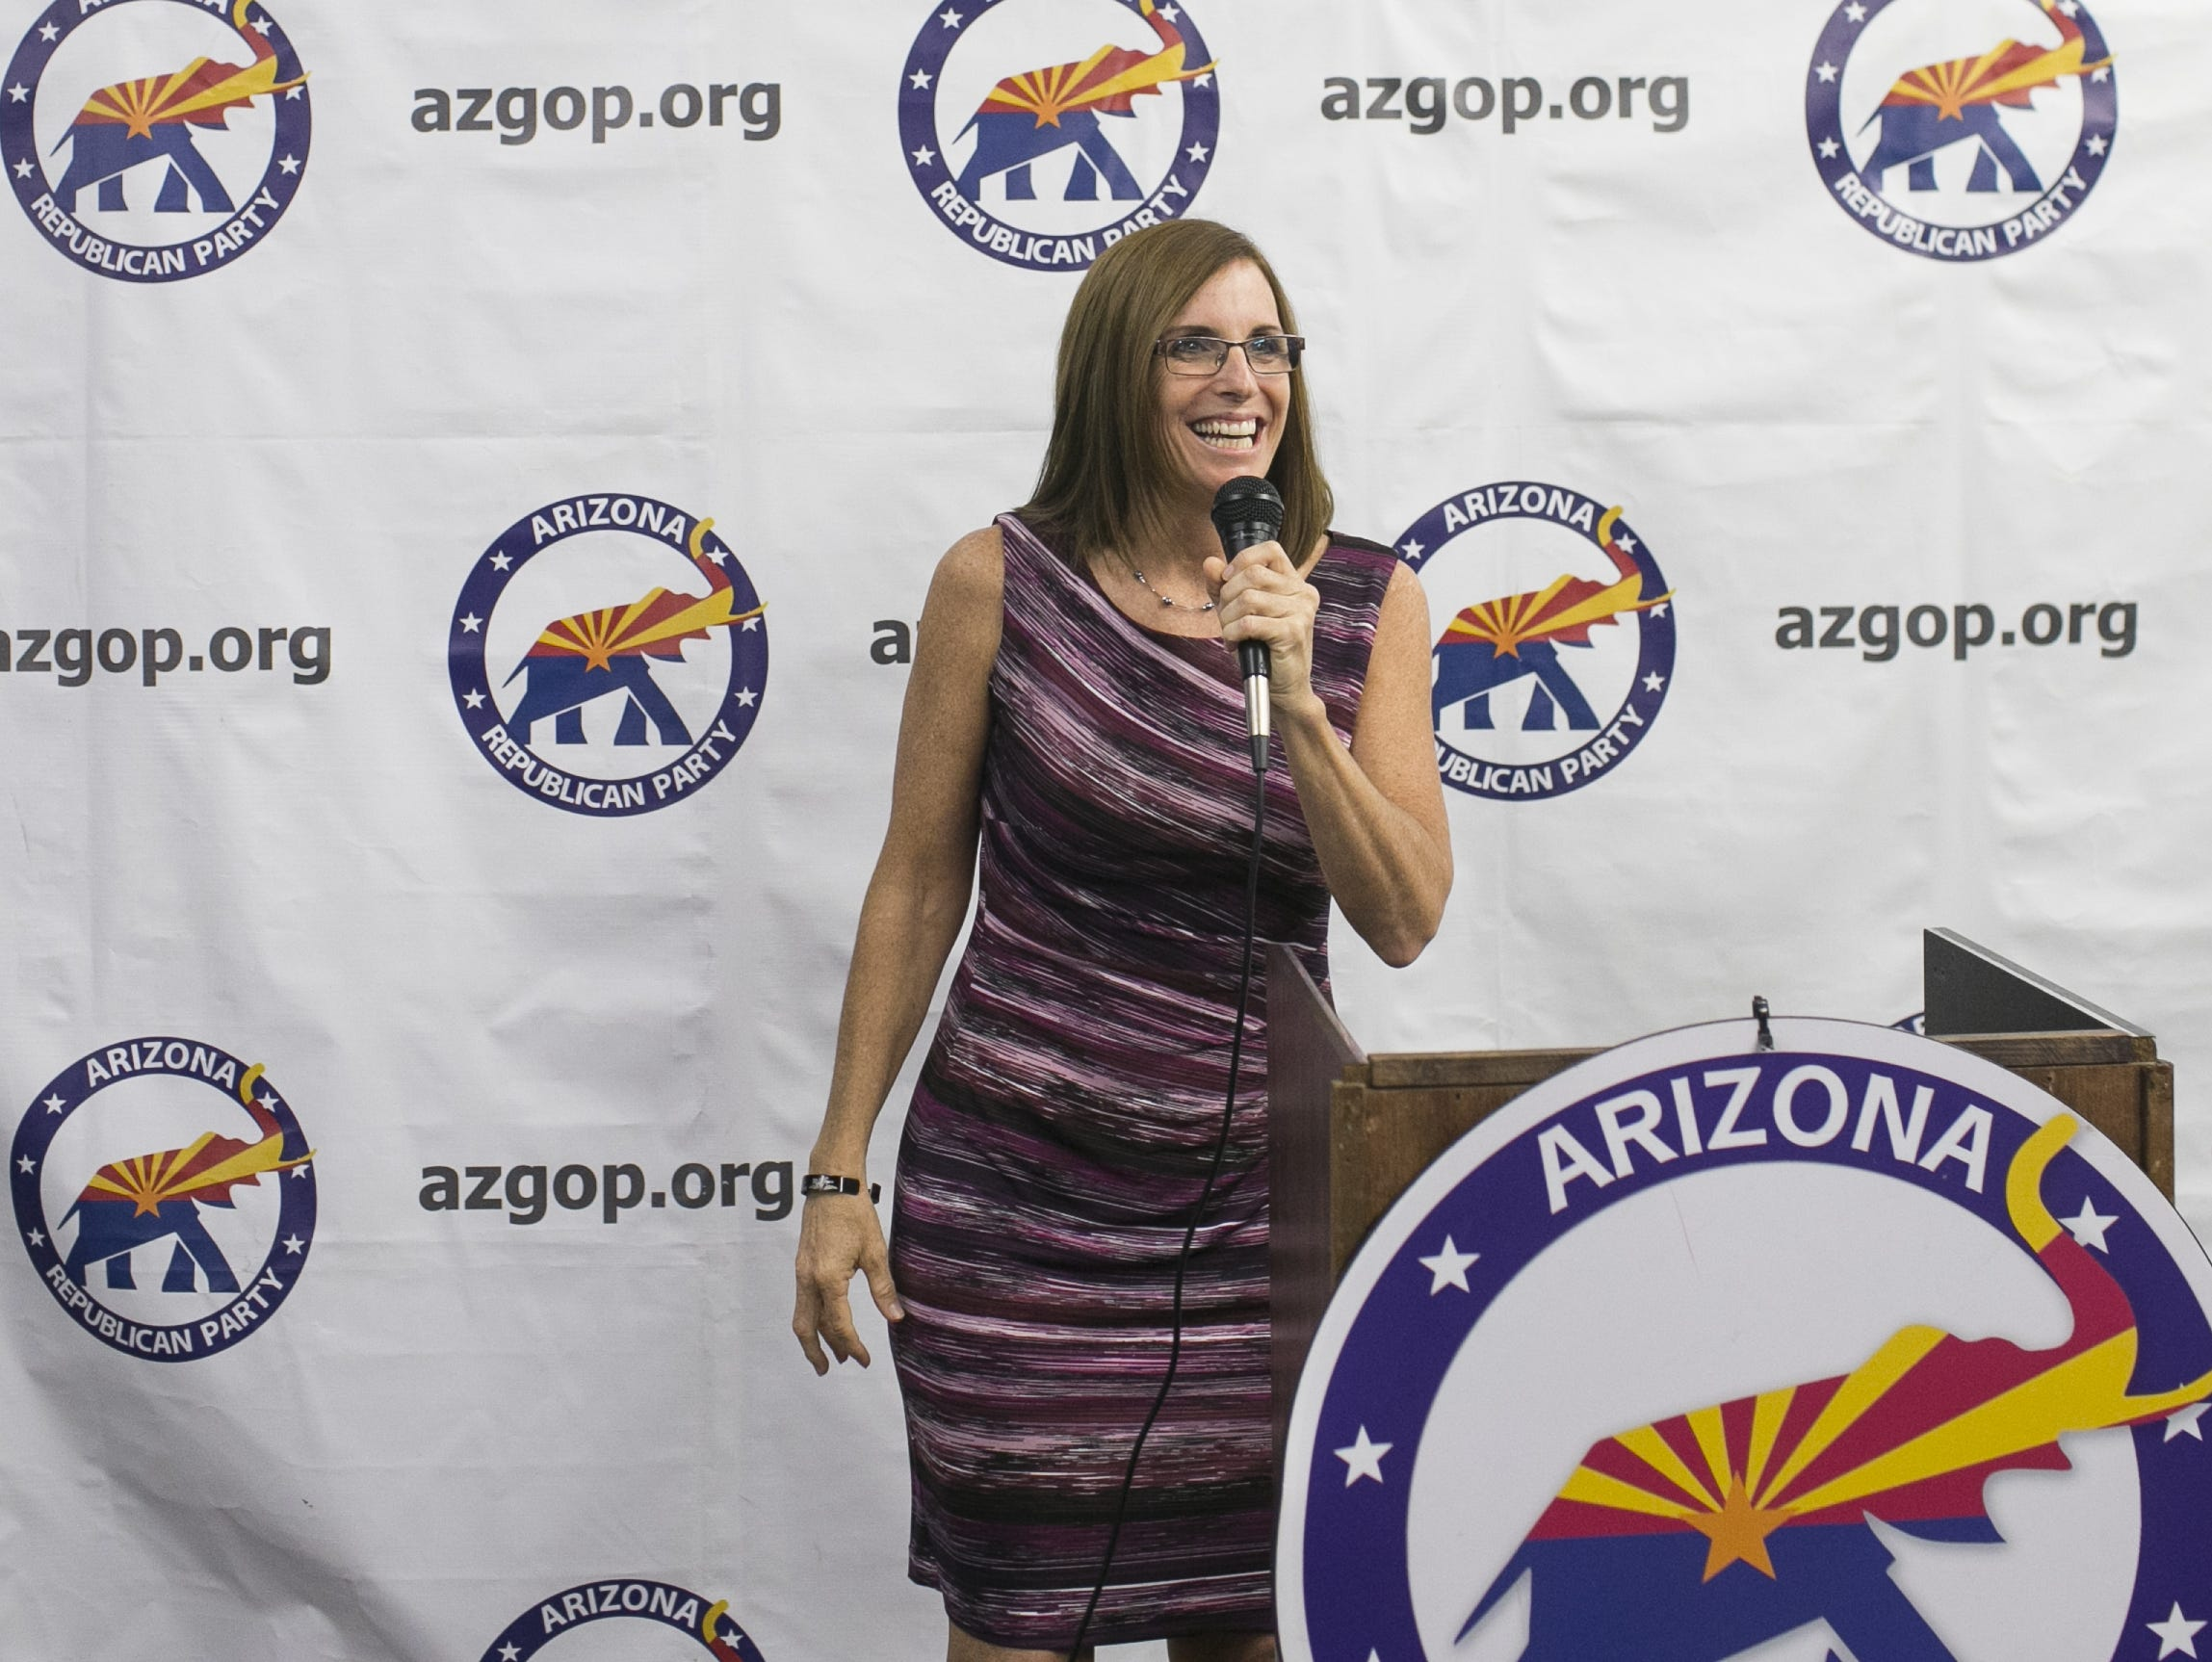 U.S. Senate candidate Martha McSally speaks at the Arizona GOP headquarters in Phoenix, Ariz. on Oct. 27, 2018.